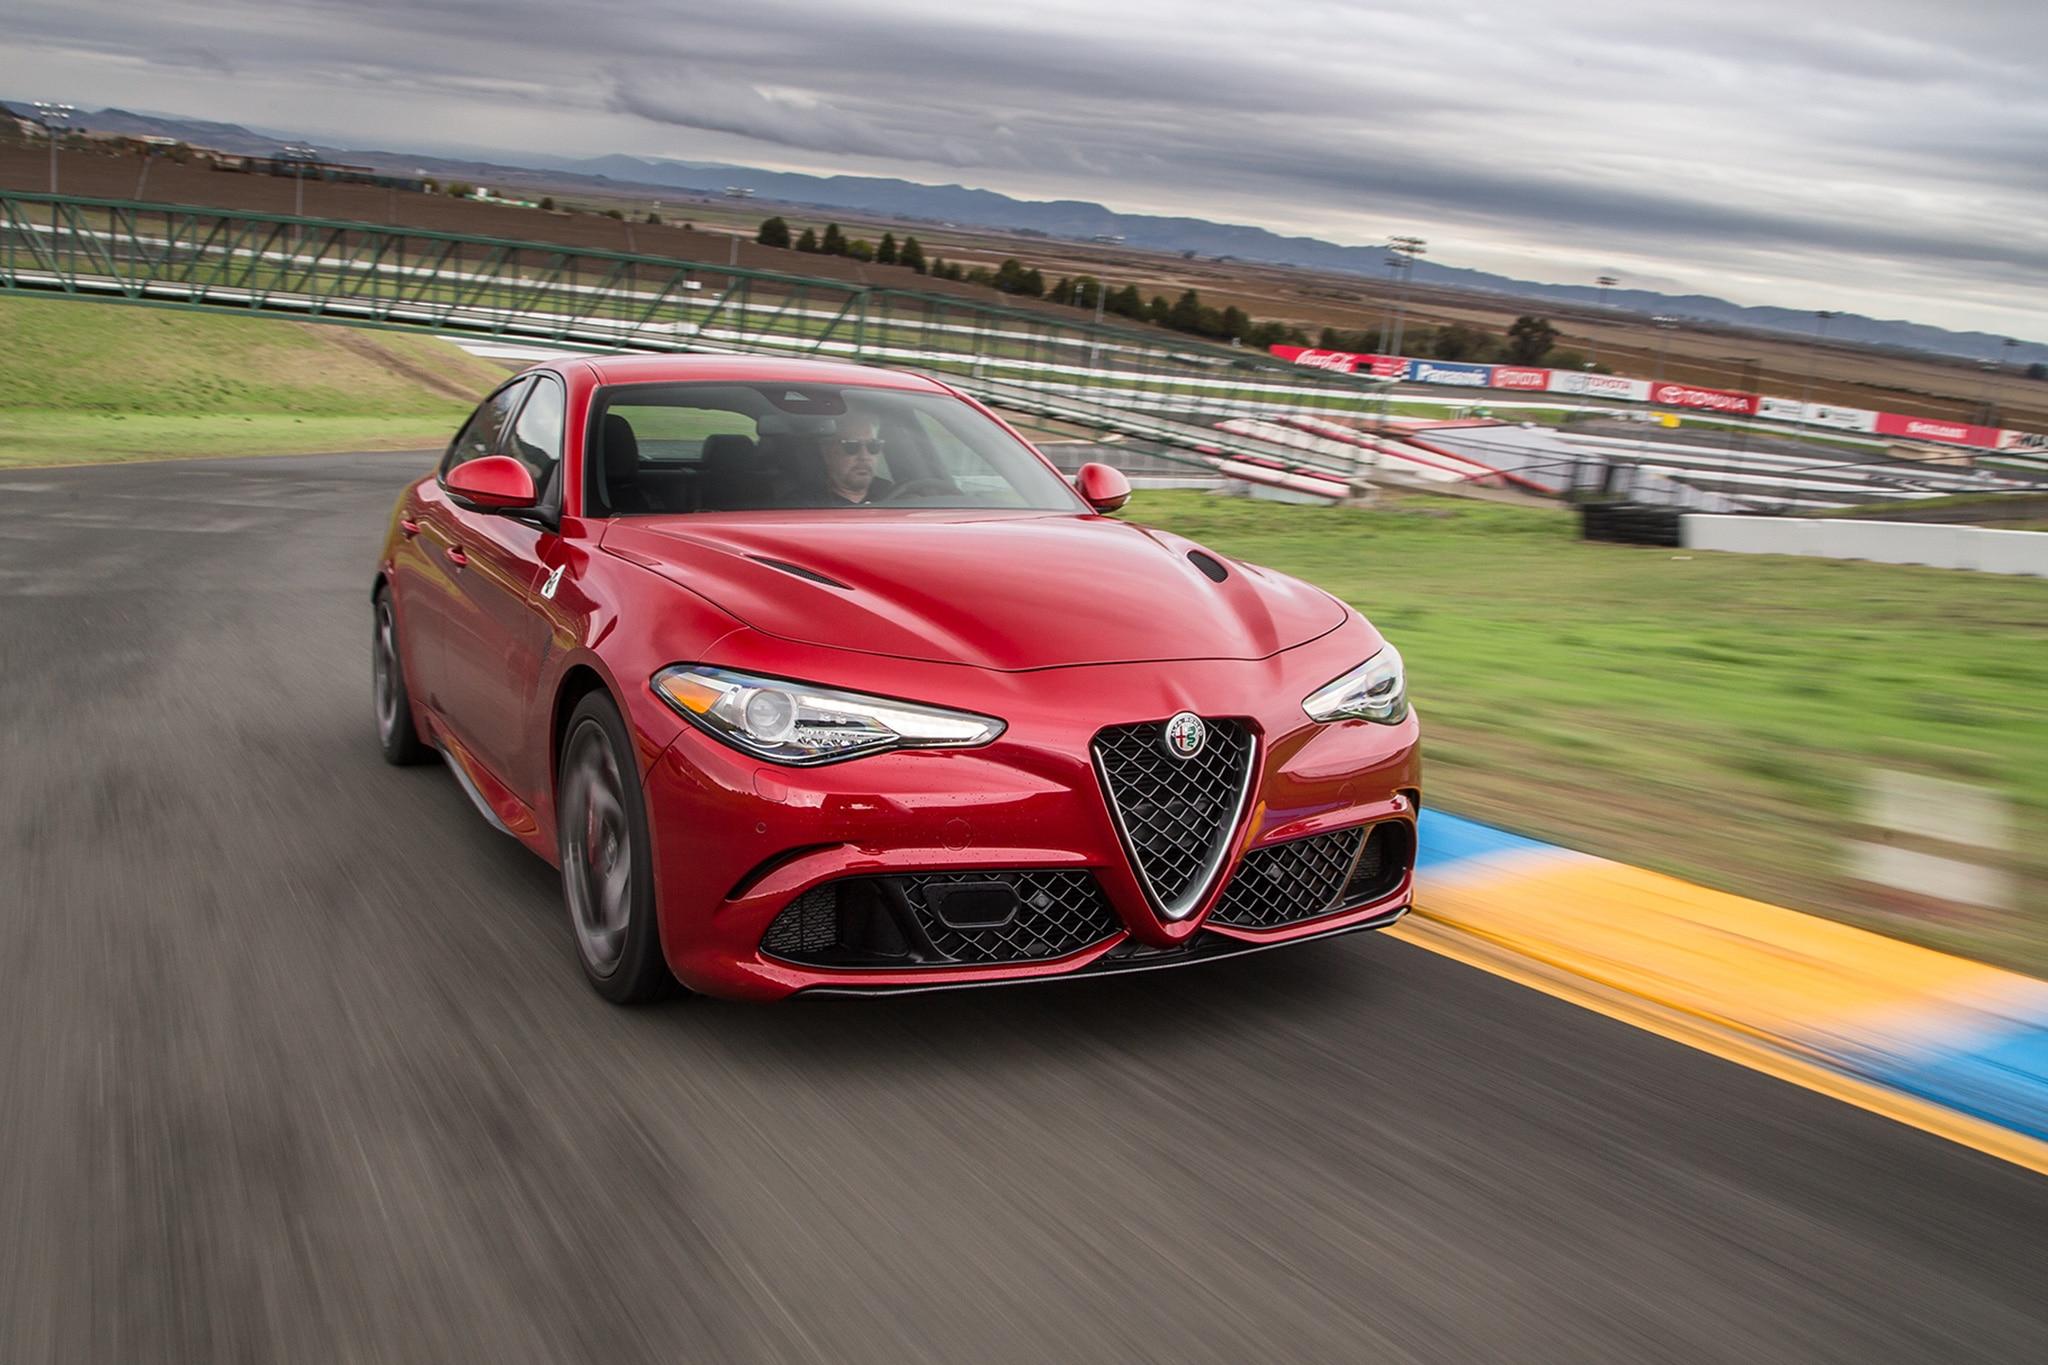 2017 Alfa Romeo Giulia Quadrifoglio Front Three Quarter In Motion 01 1